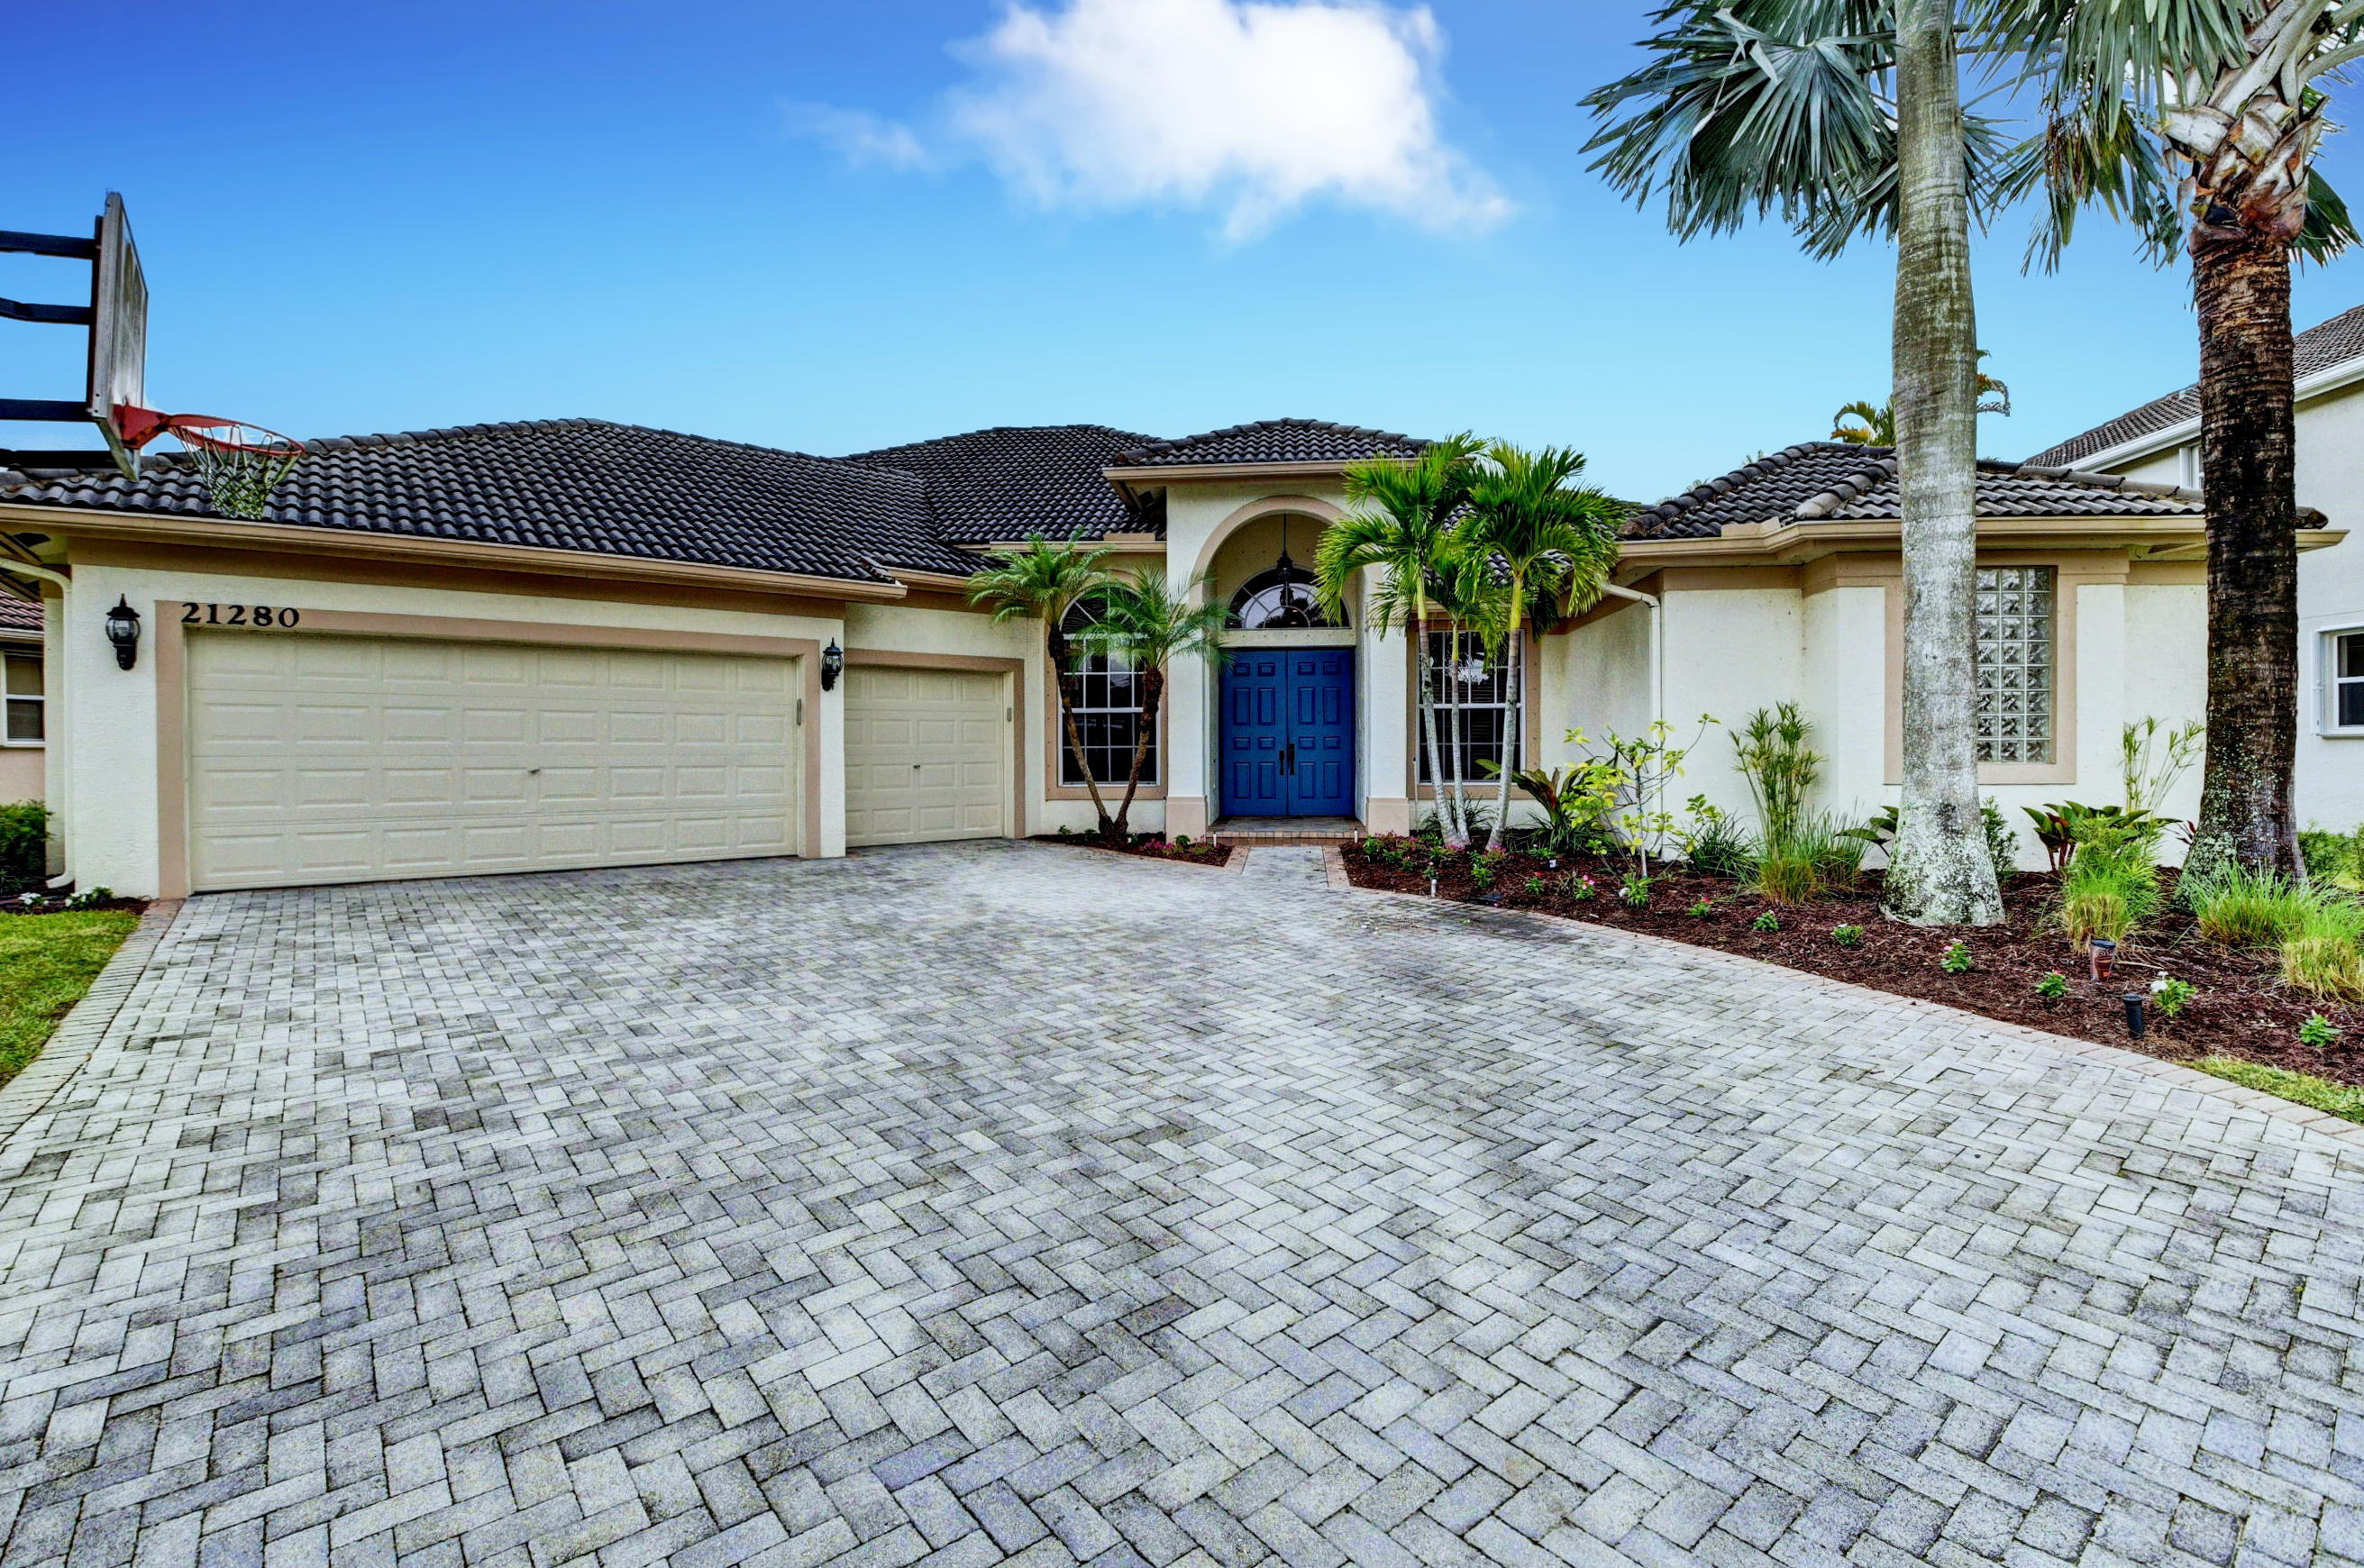 Photo of 21280 Rock Ridge Drive, Boca Raton, FL 33428